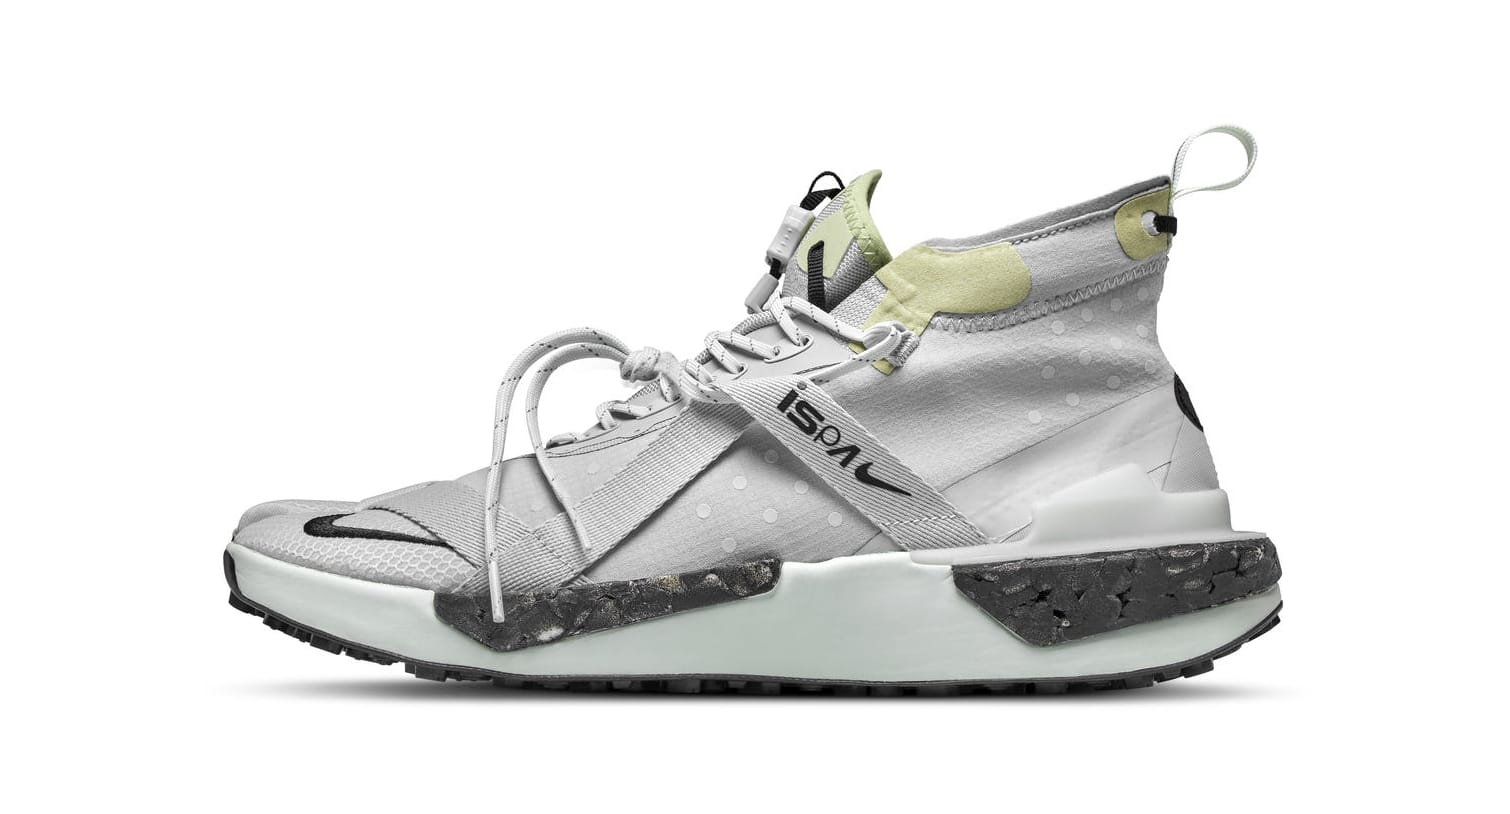 Nike ISPA Drifter Lateral